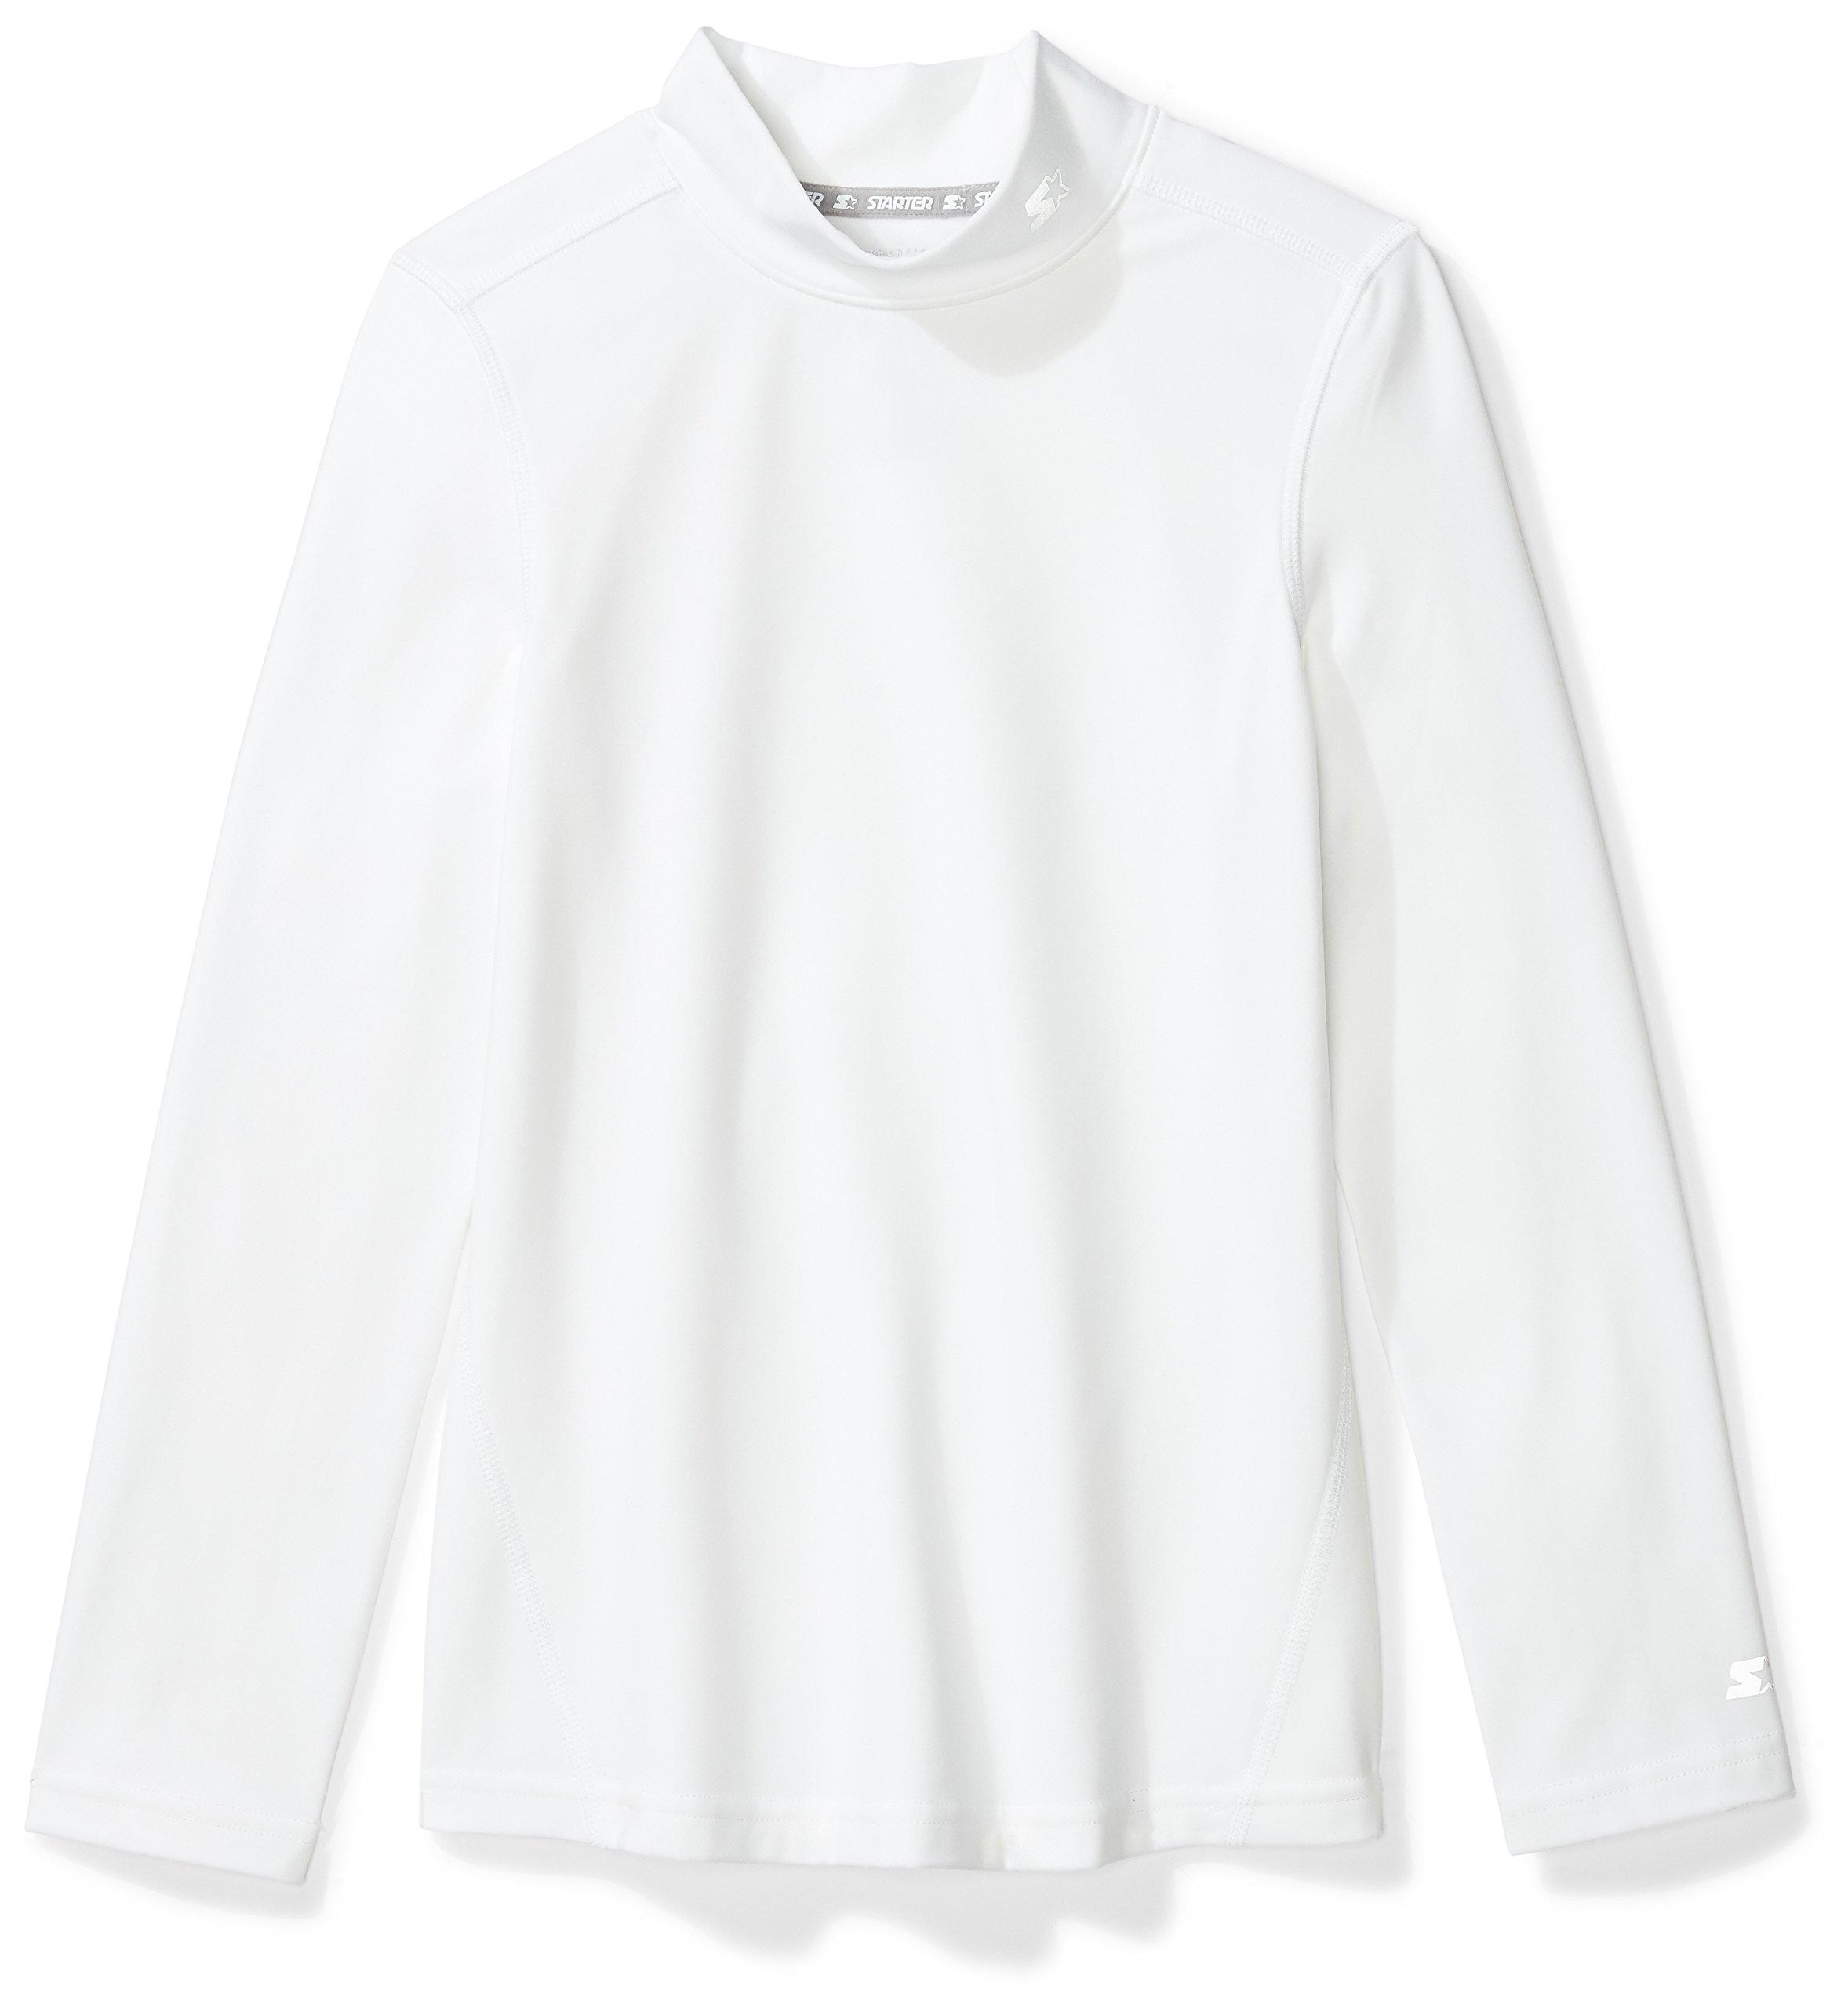 Starter Girls' Long Sleeve Mock Neck Athletic Light-Compression T-Shirt, Prime Exclusive, White, L (10/12)